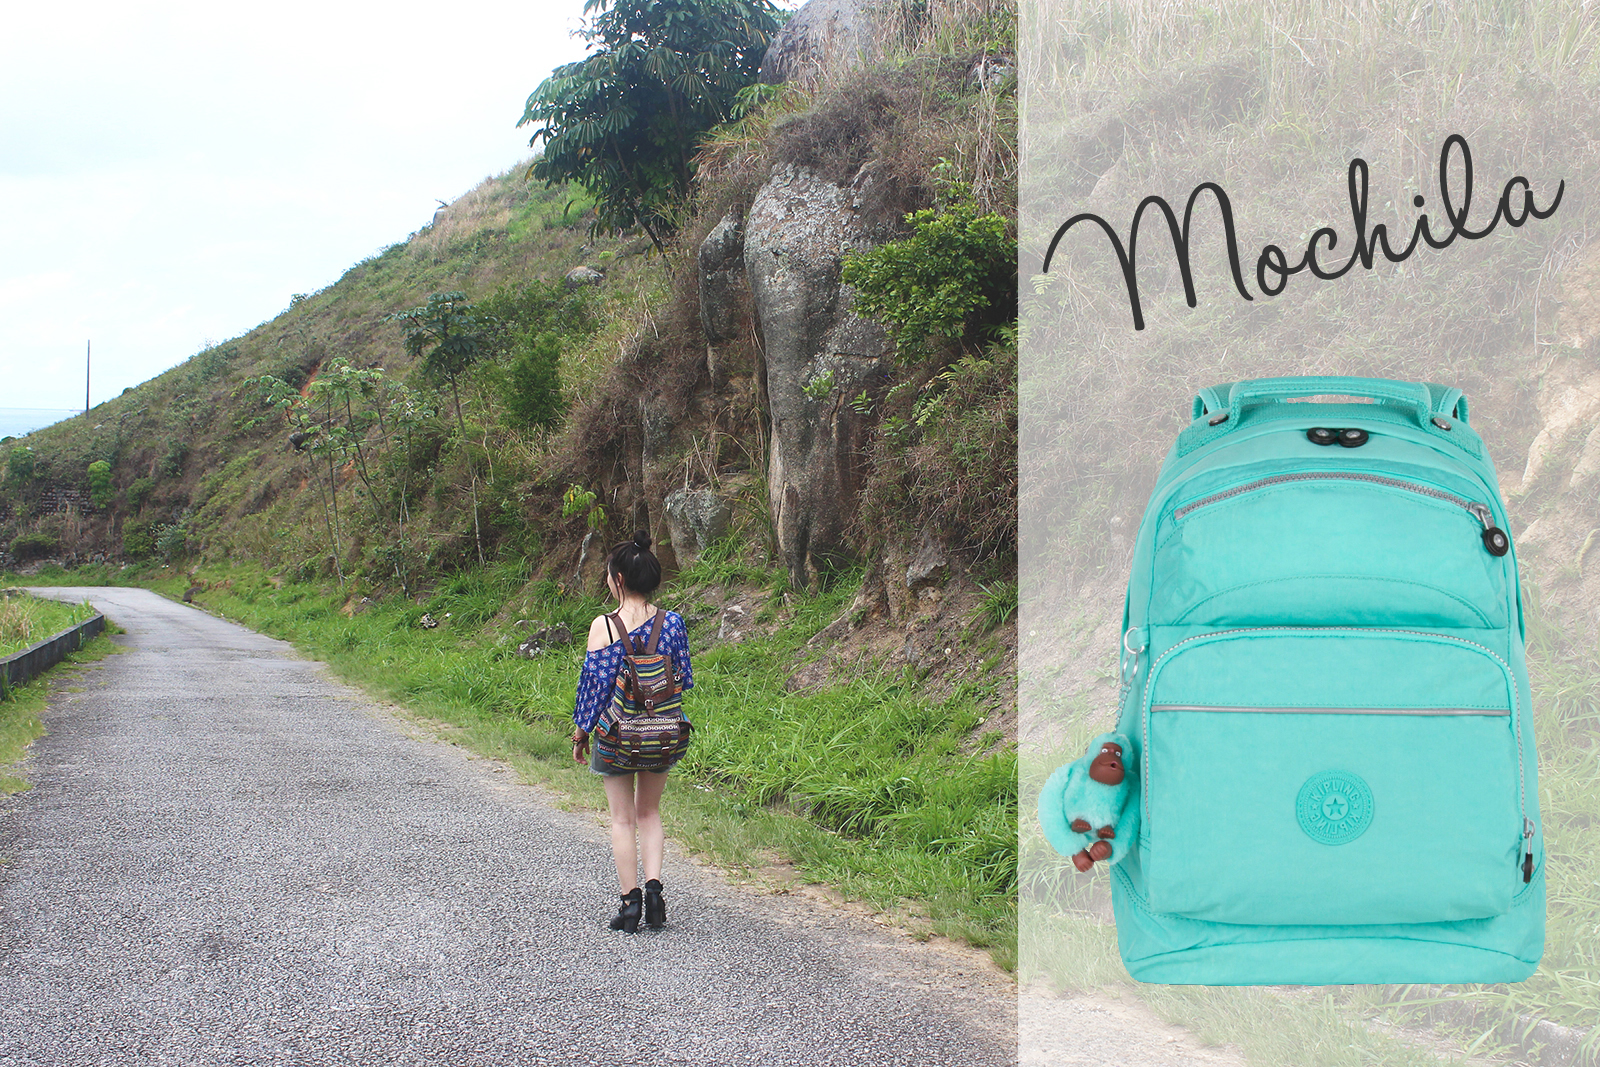 http://www.kipling.com.br/produto/mochila-ichiwa-s-verde-agua-vivid-turquoise-kipling-63640